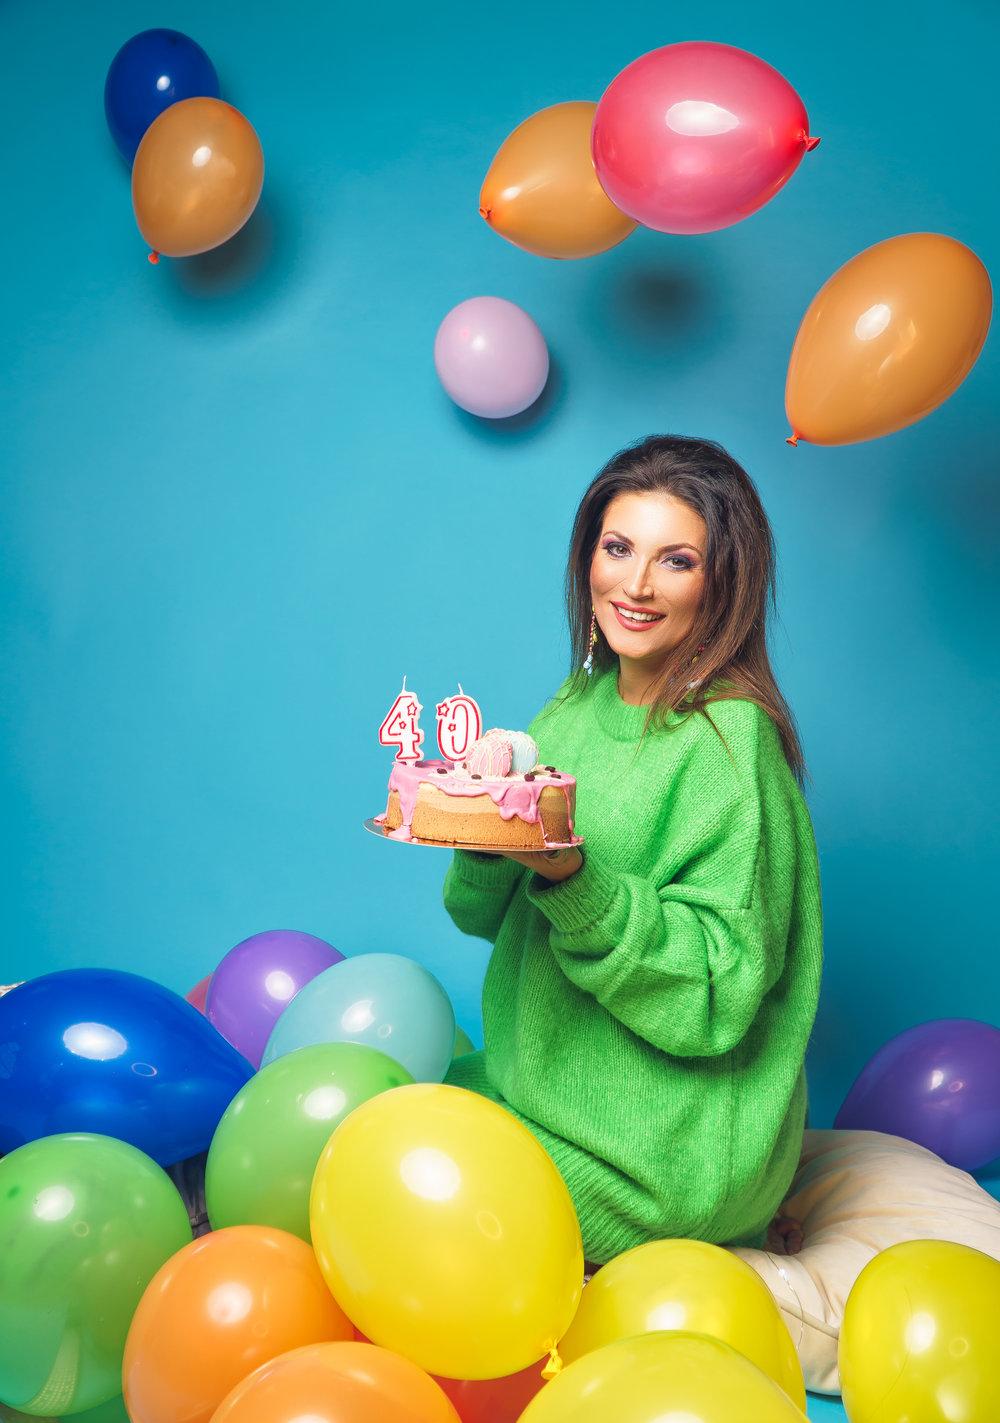 Ioana Ginghina studio sedinta foto clar visator crina popescu creativ aniversar colorat baloane.jpg